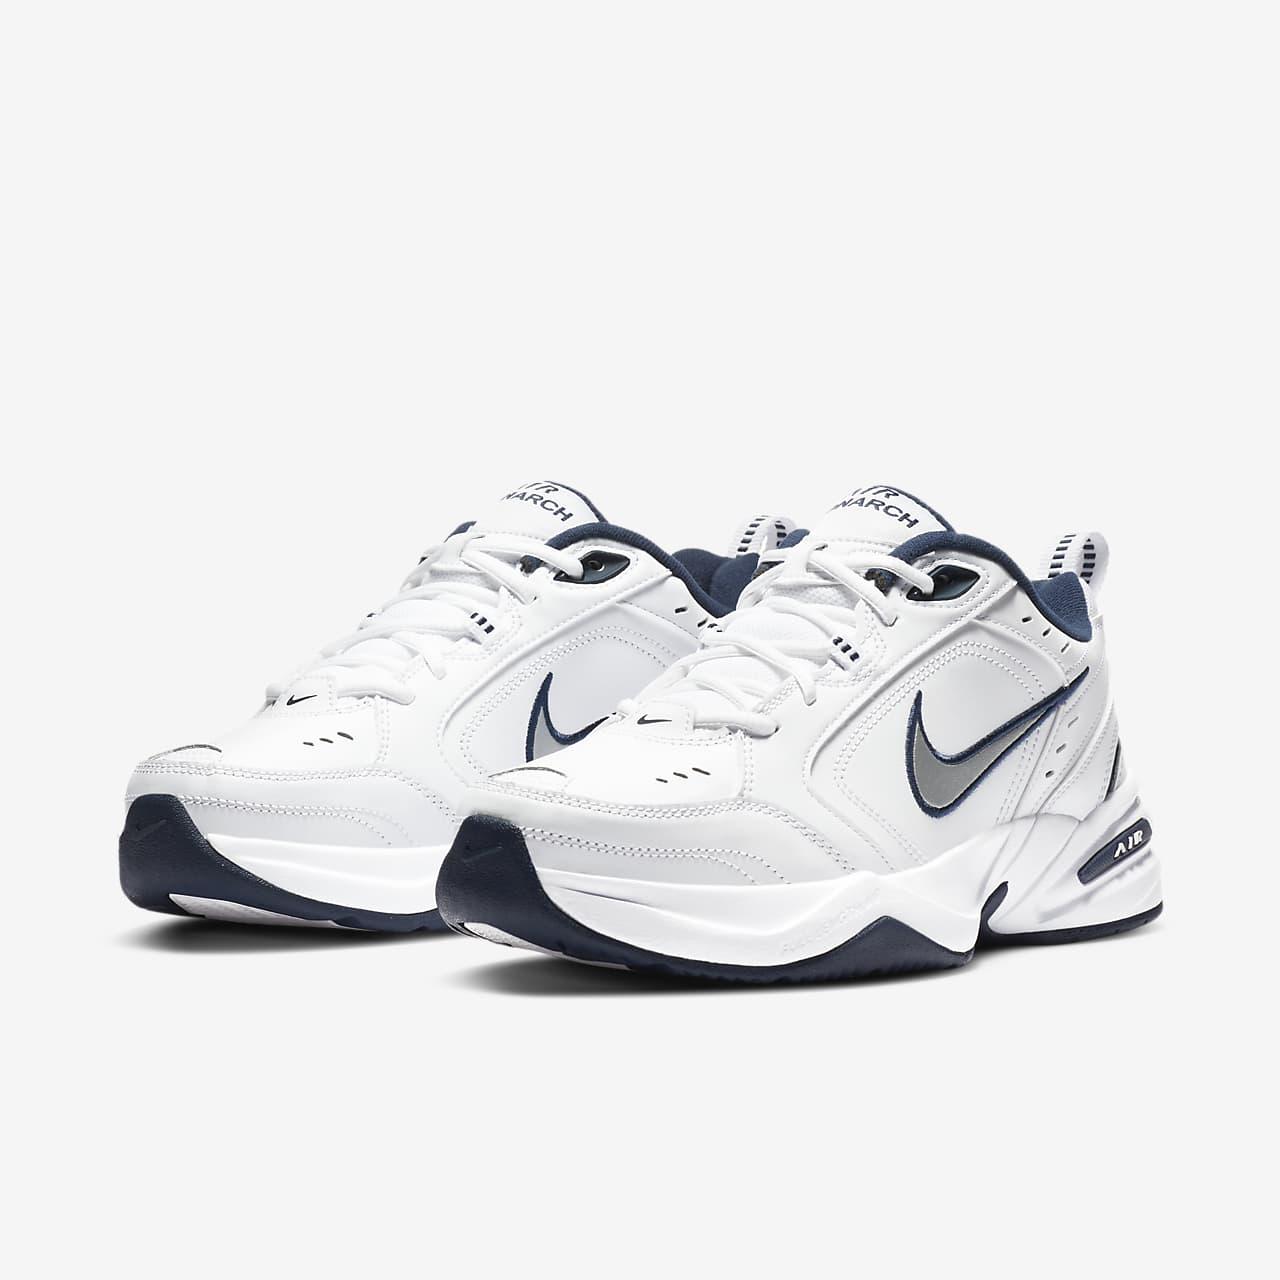 sale retailer 56de9 040ef ... Scarpa da palestra lifestyle Nike Air Monarch IV